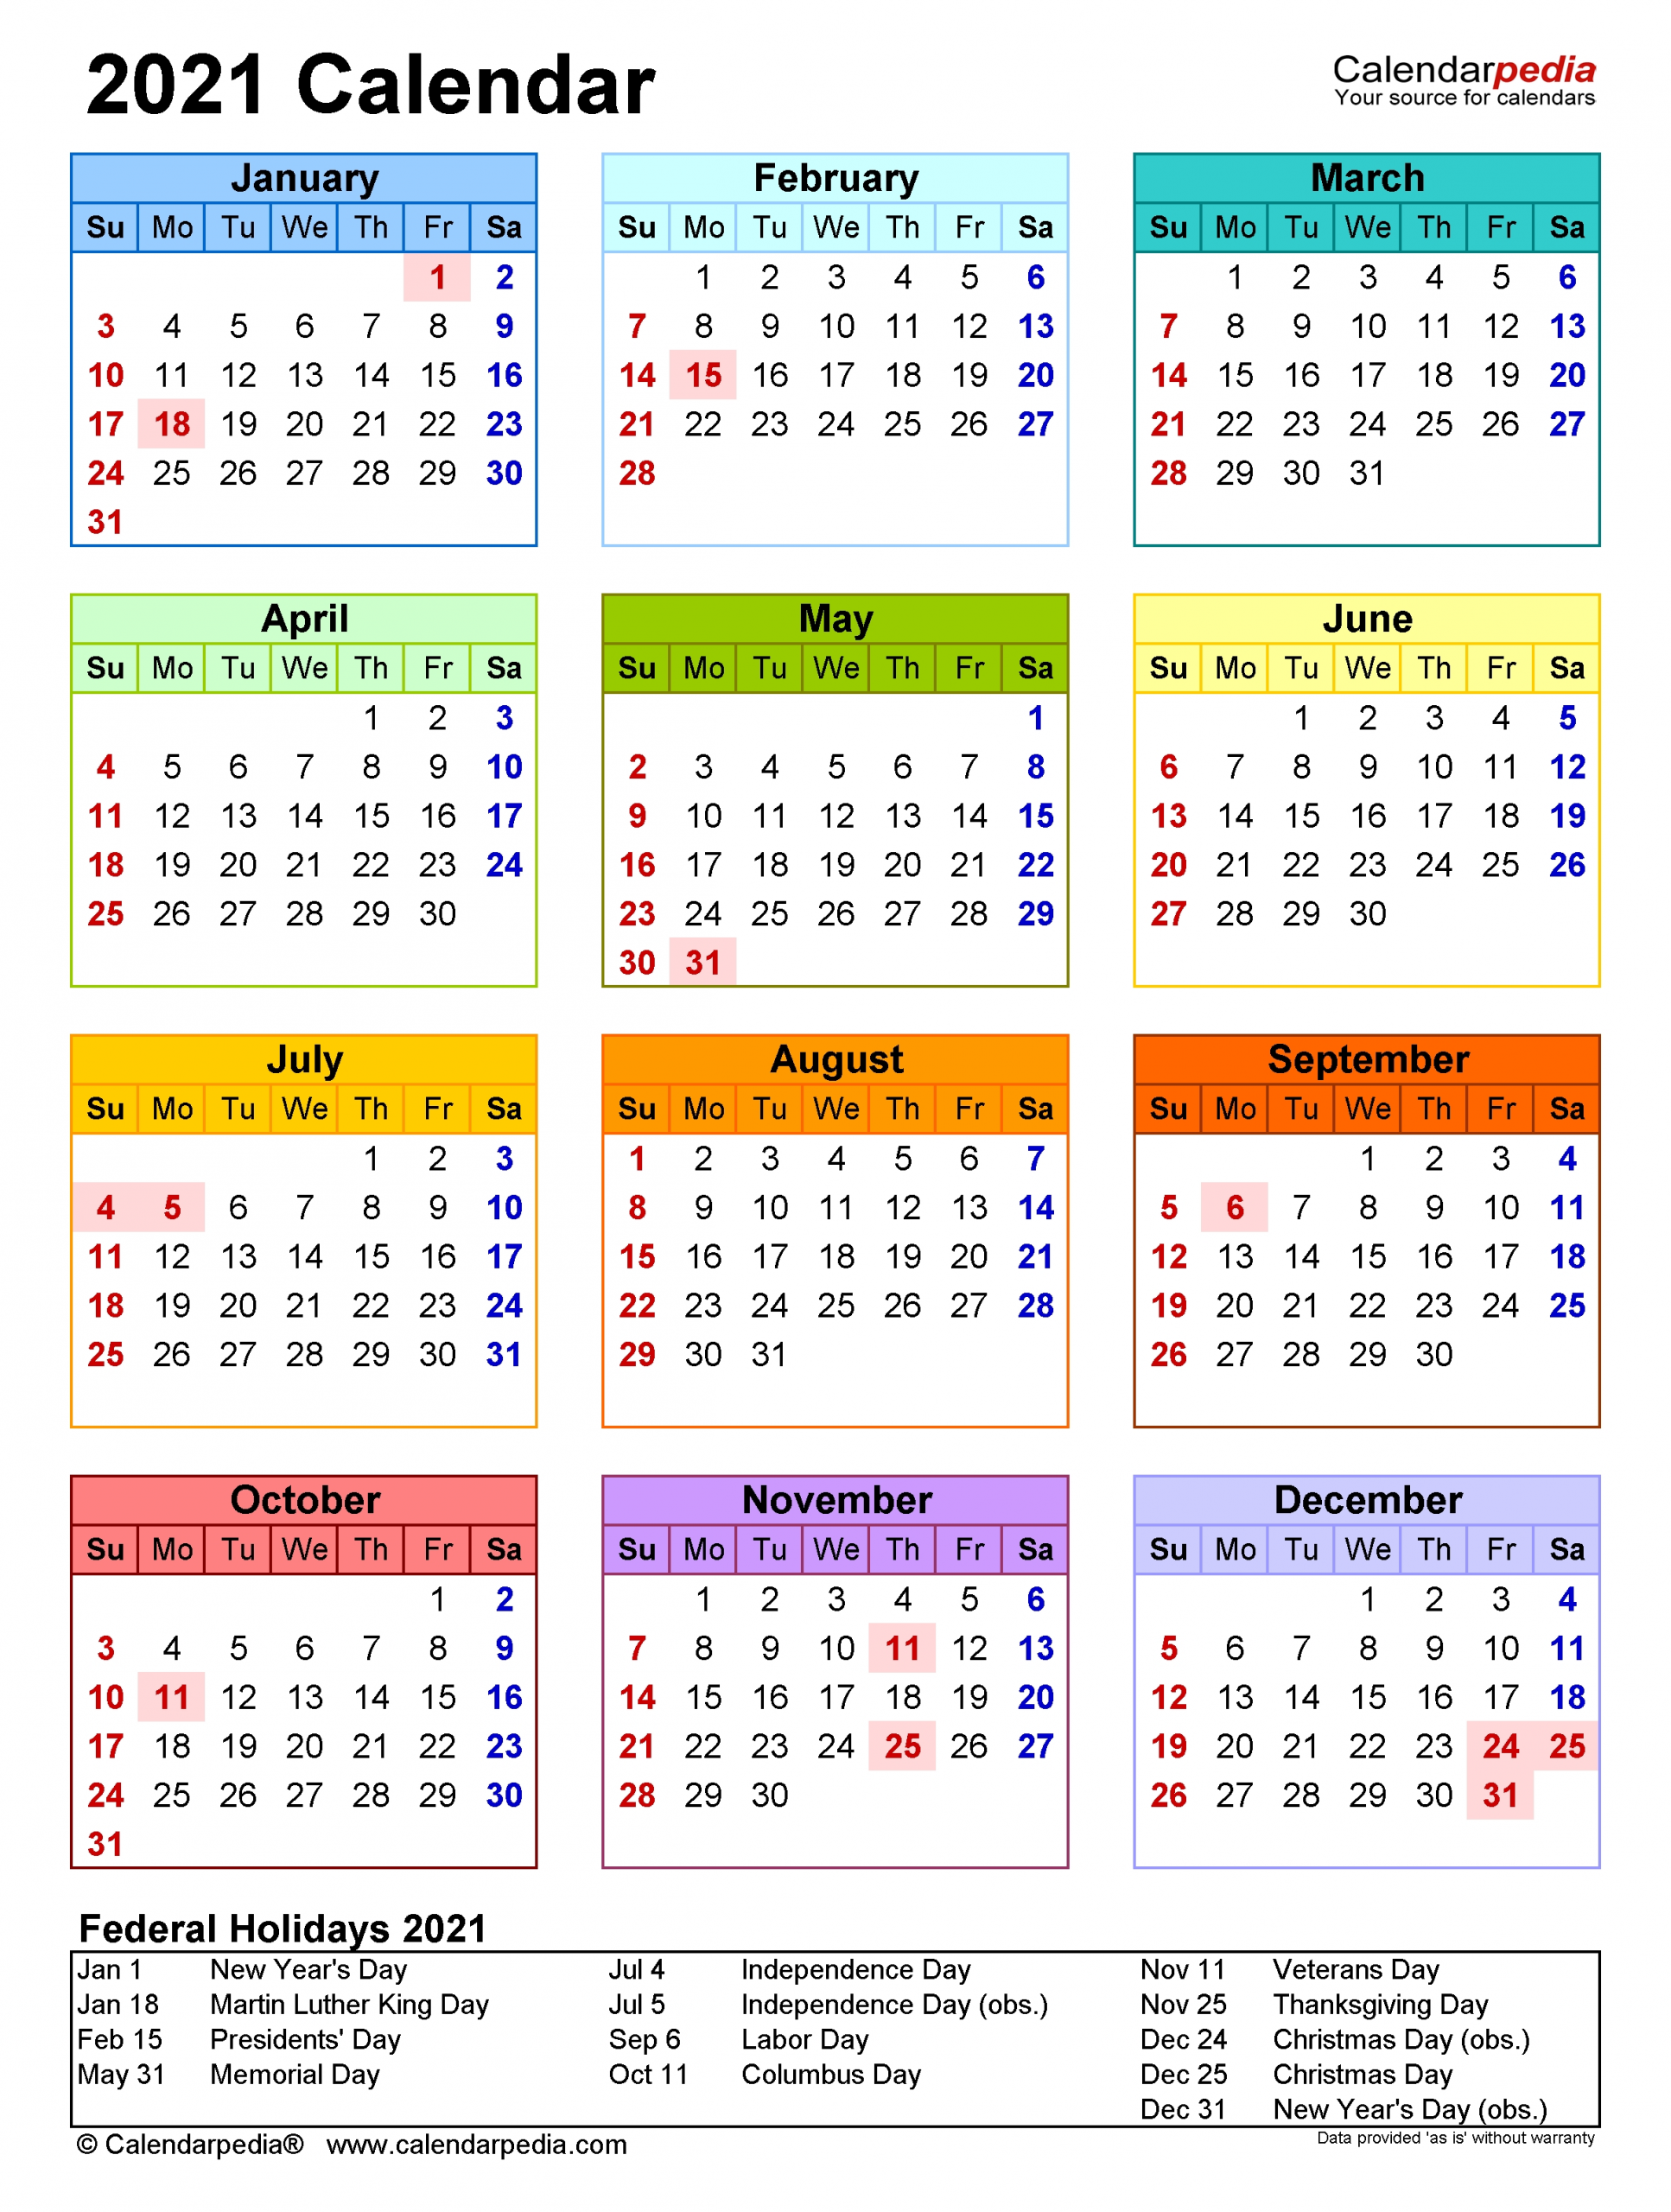 2021 Calendar - Free Printable Excel Templates - Calendarpedia for Three Year Calendar 2019 2021 2021 Calendar Pedia